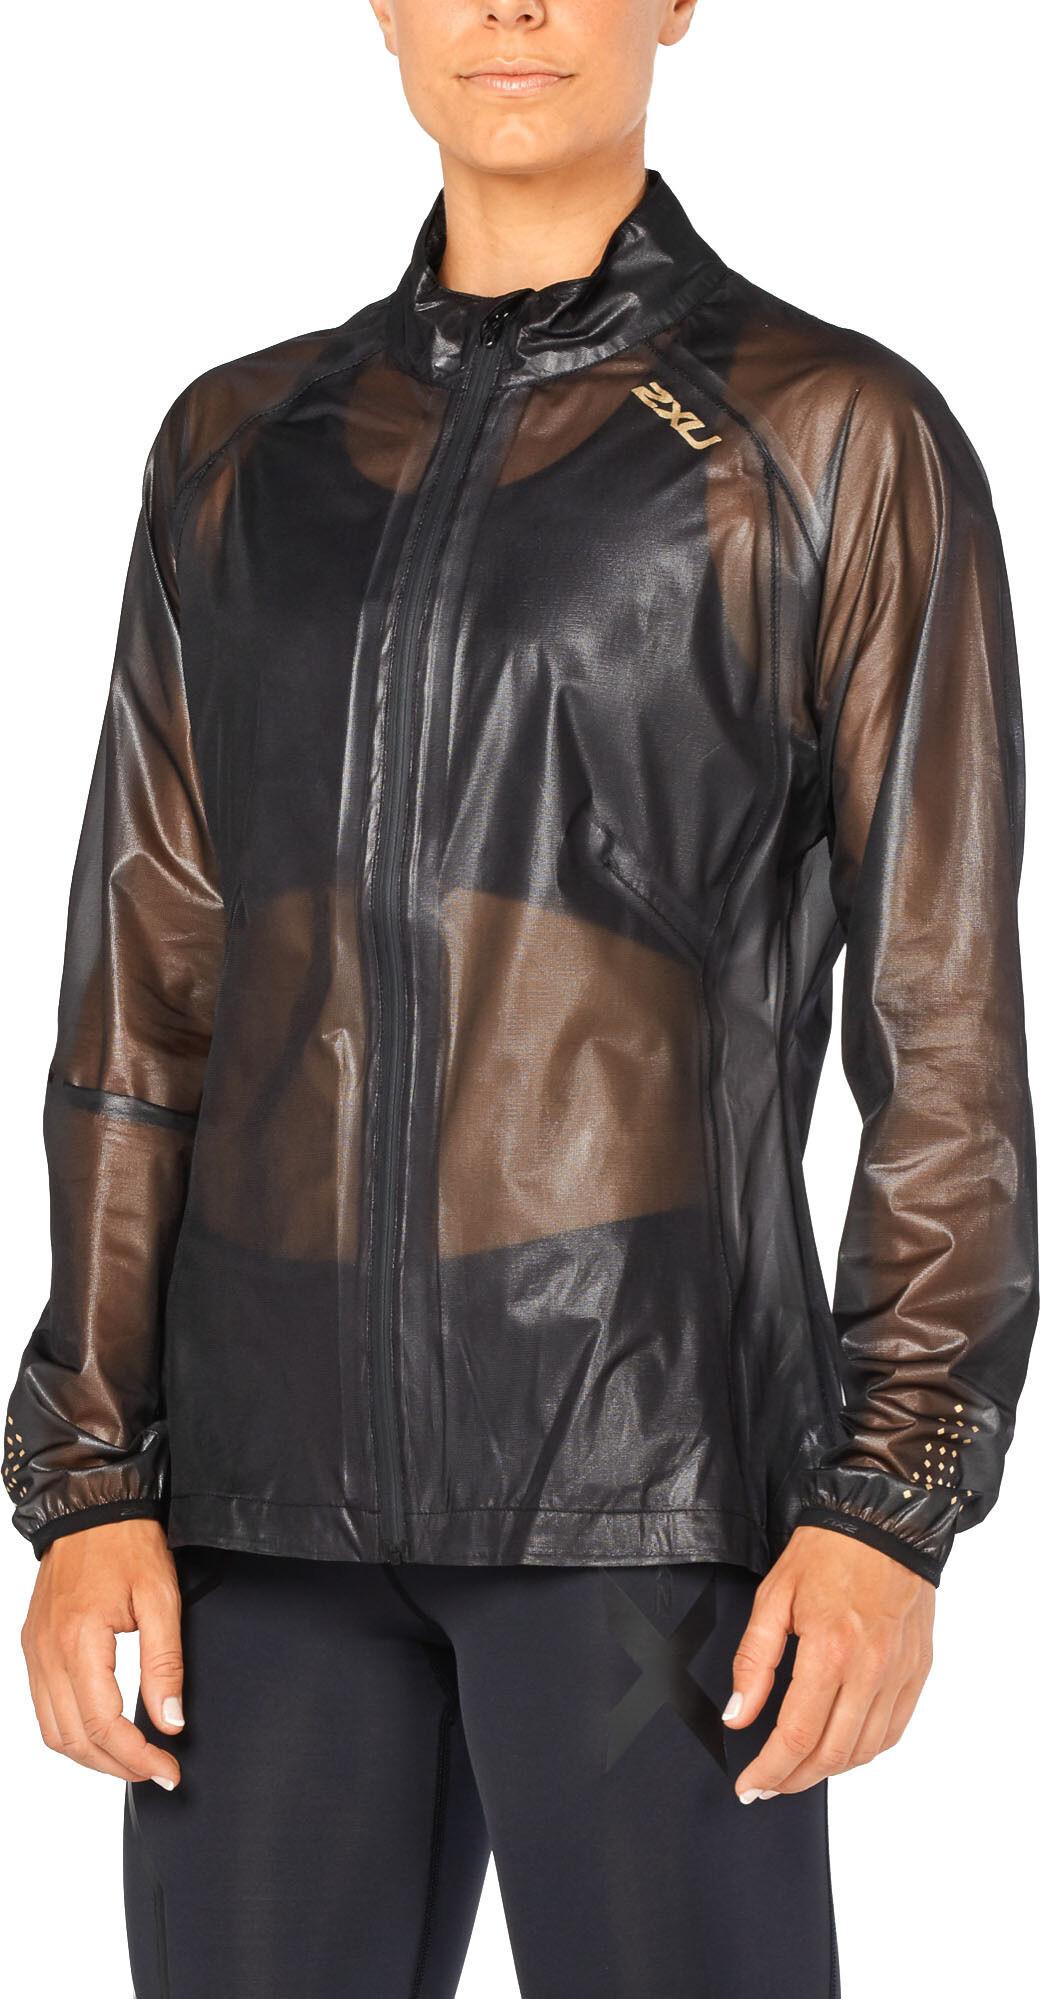 2XU GHST Membrane Jacket Dam blackgold